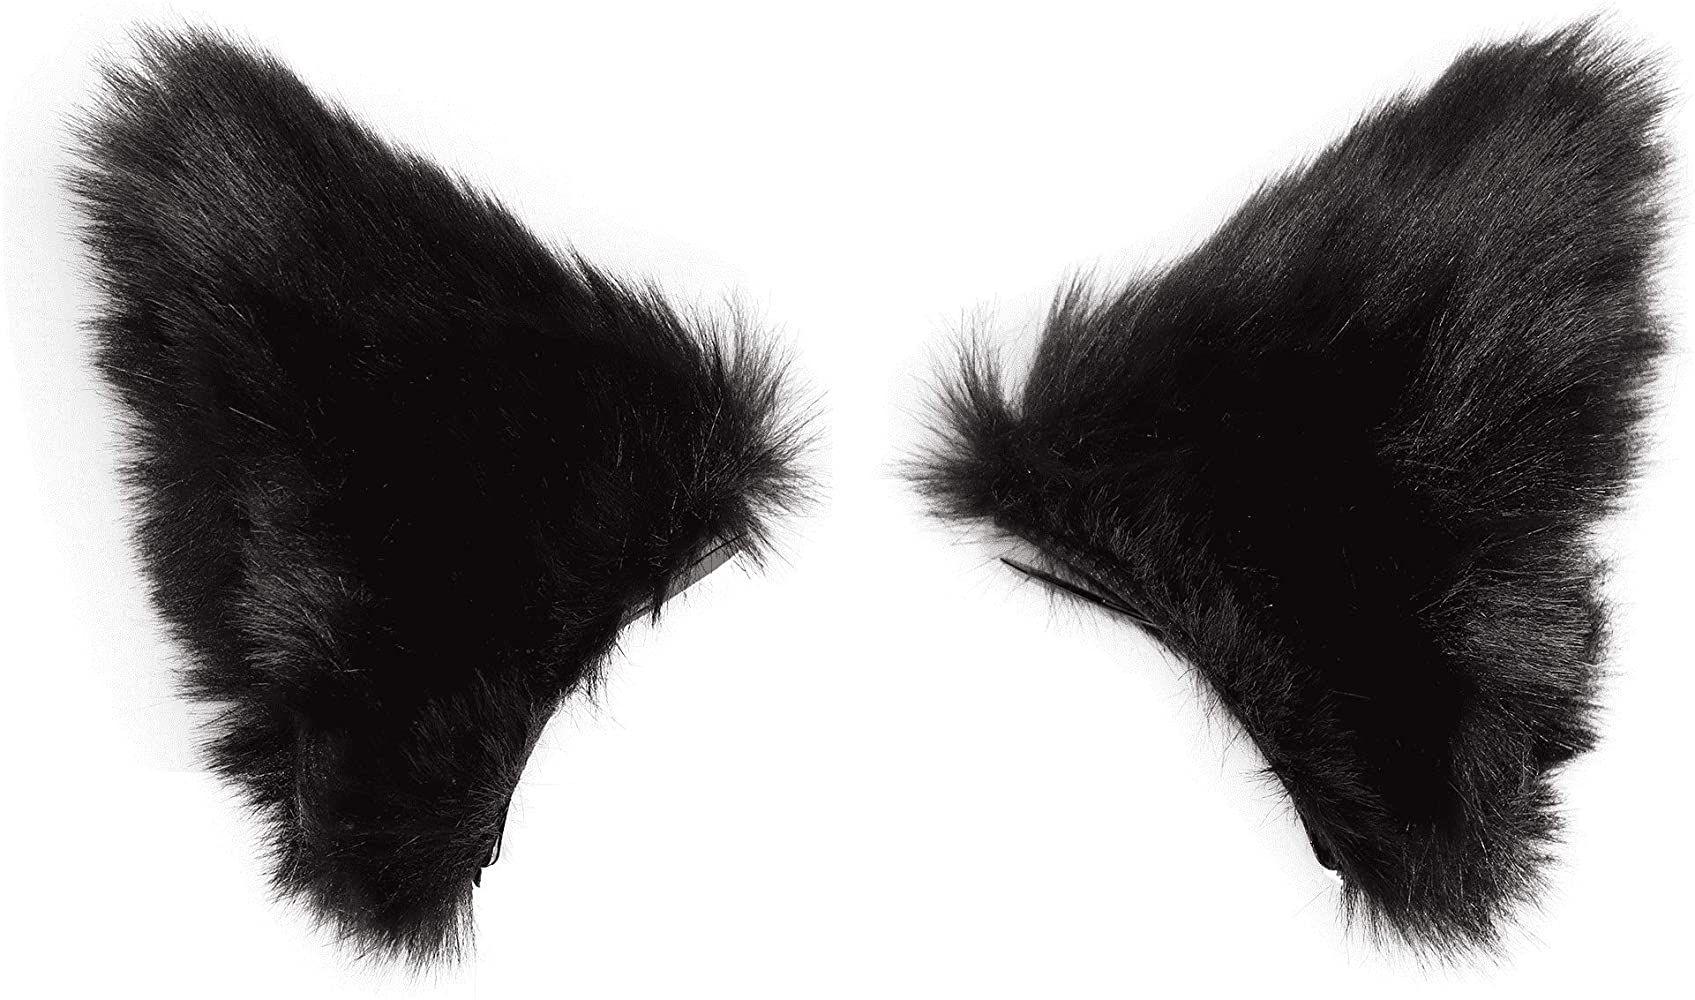 Amazon Com Cat Fox Long Fur Ears Headband Ear Clips Headwear Anime Cosplay Halloween Costume All Black Clothing Overlays Cute Cat Headband Cosplay Anime